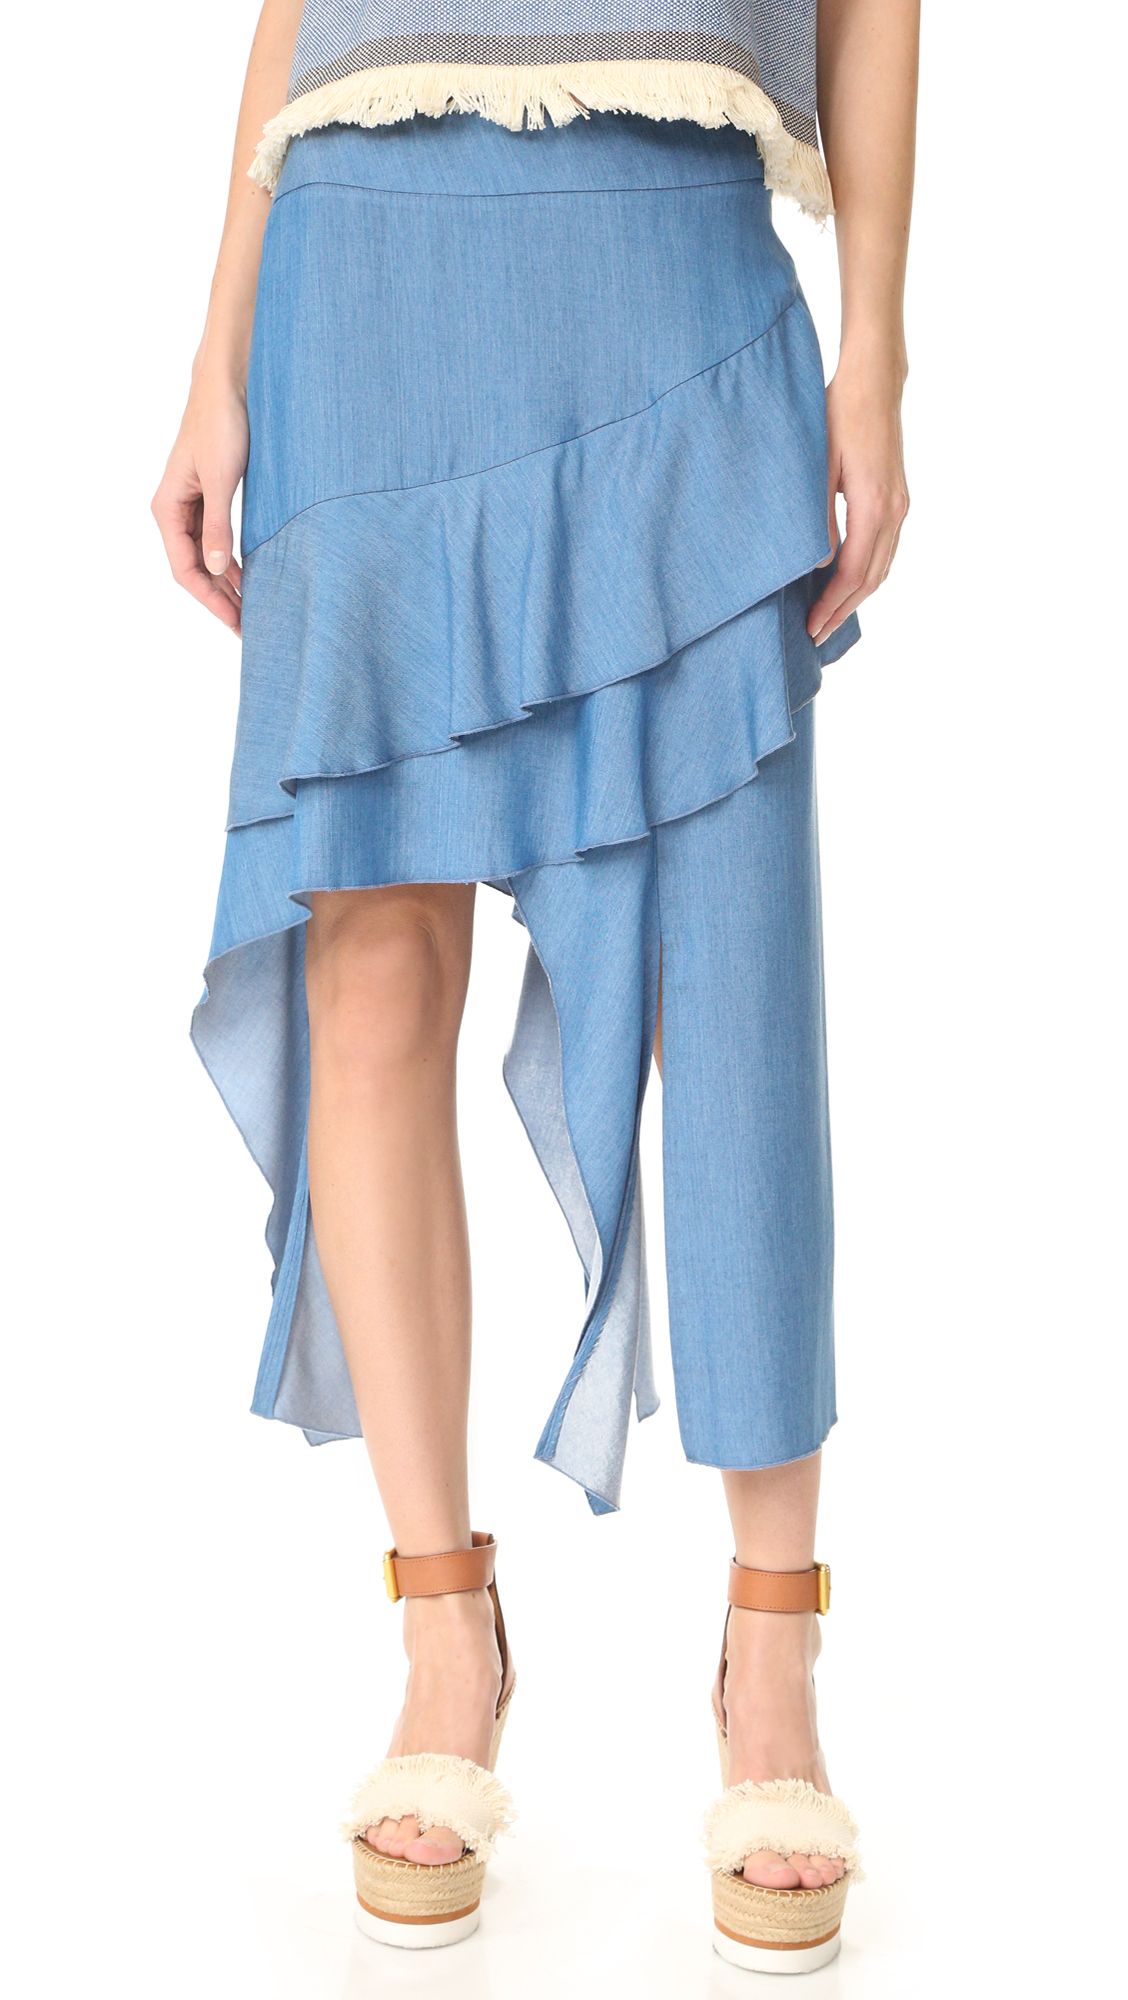 Jonathan Simkhai Fluid Chambray Hanging Skirt - Denim Chambray at Shopbop